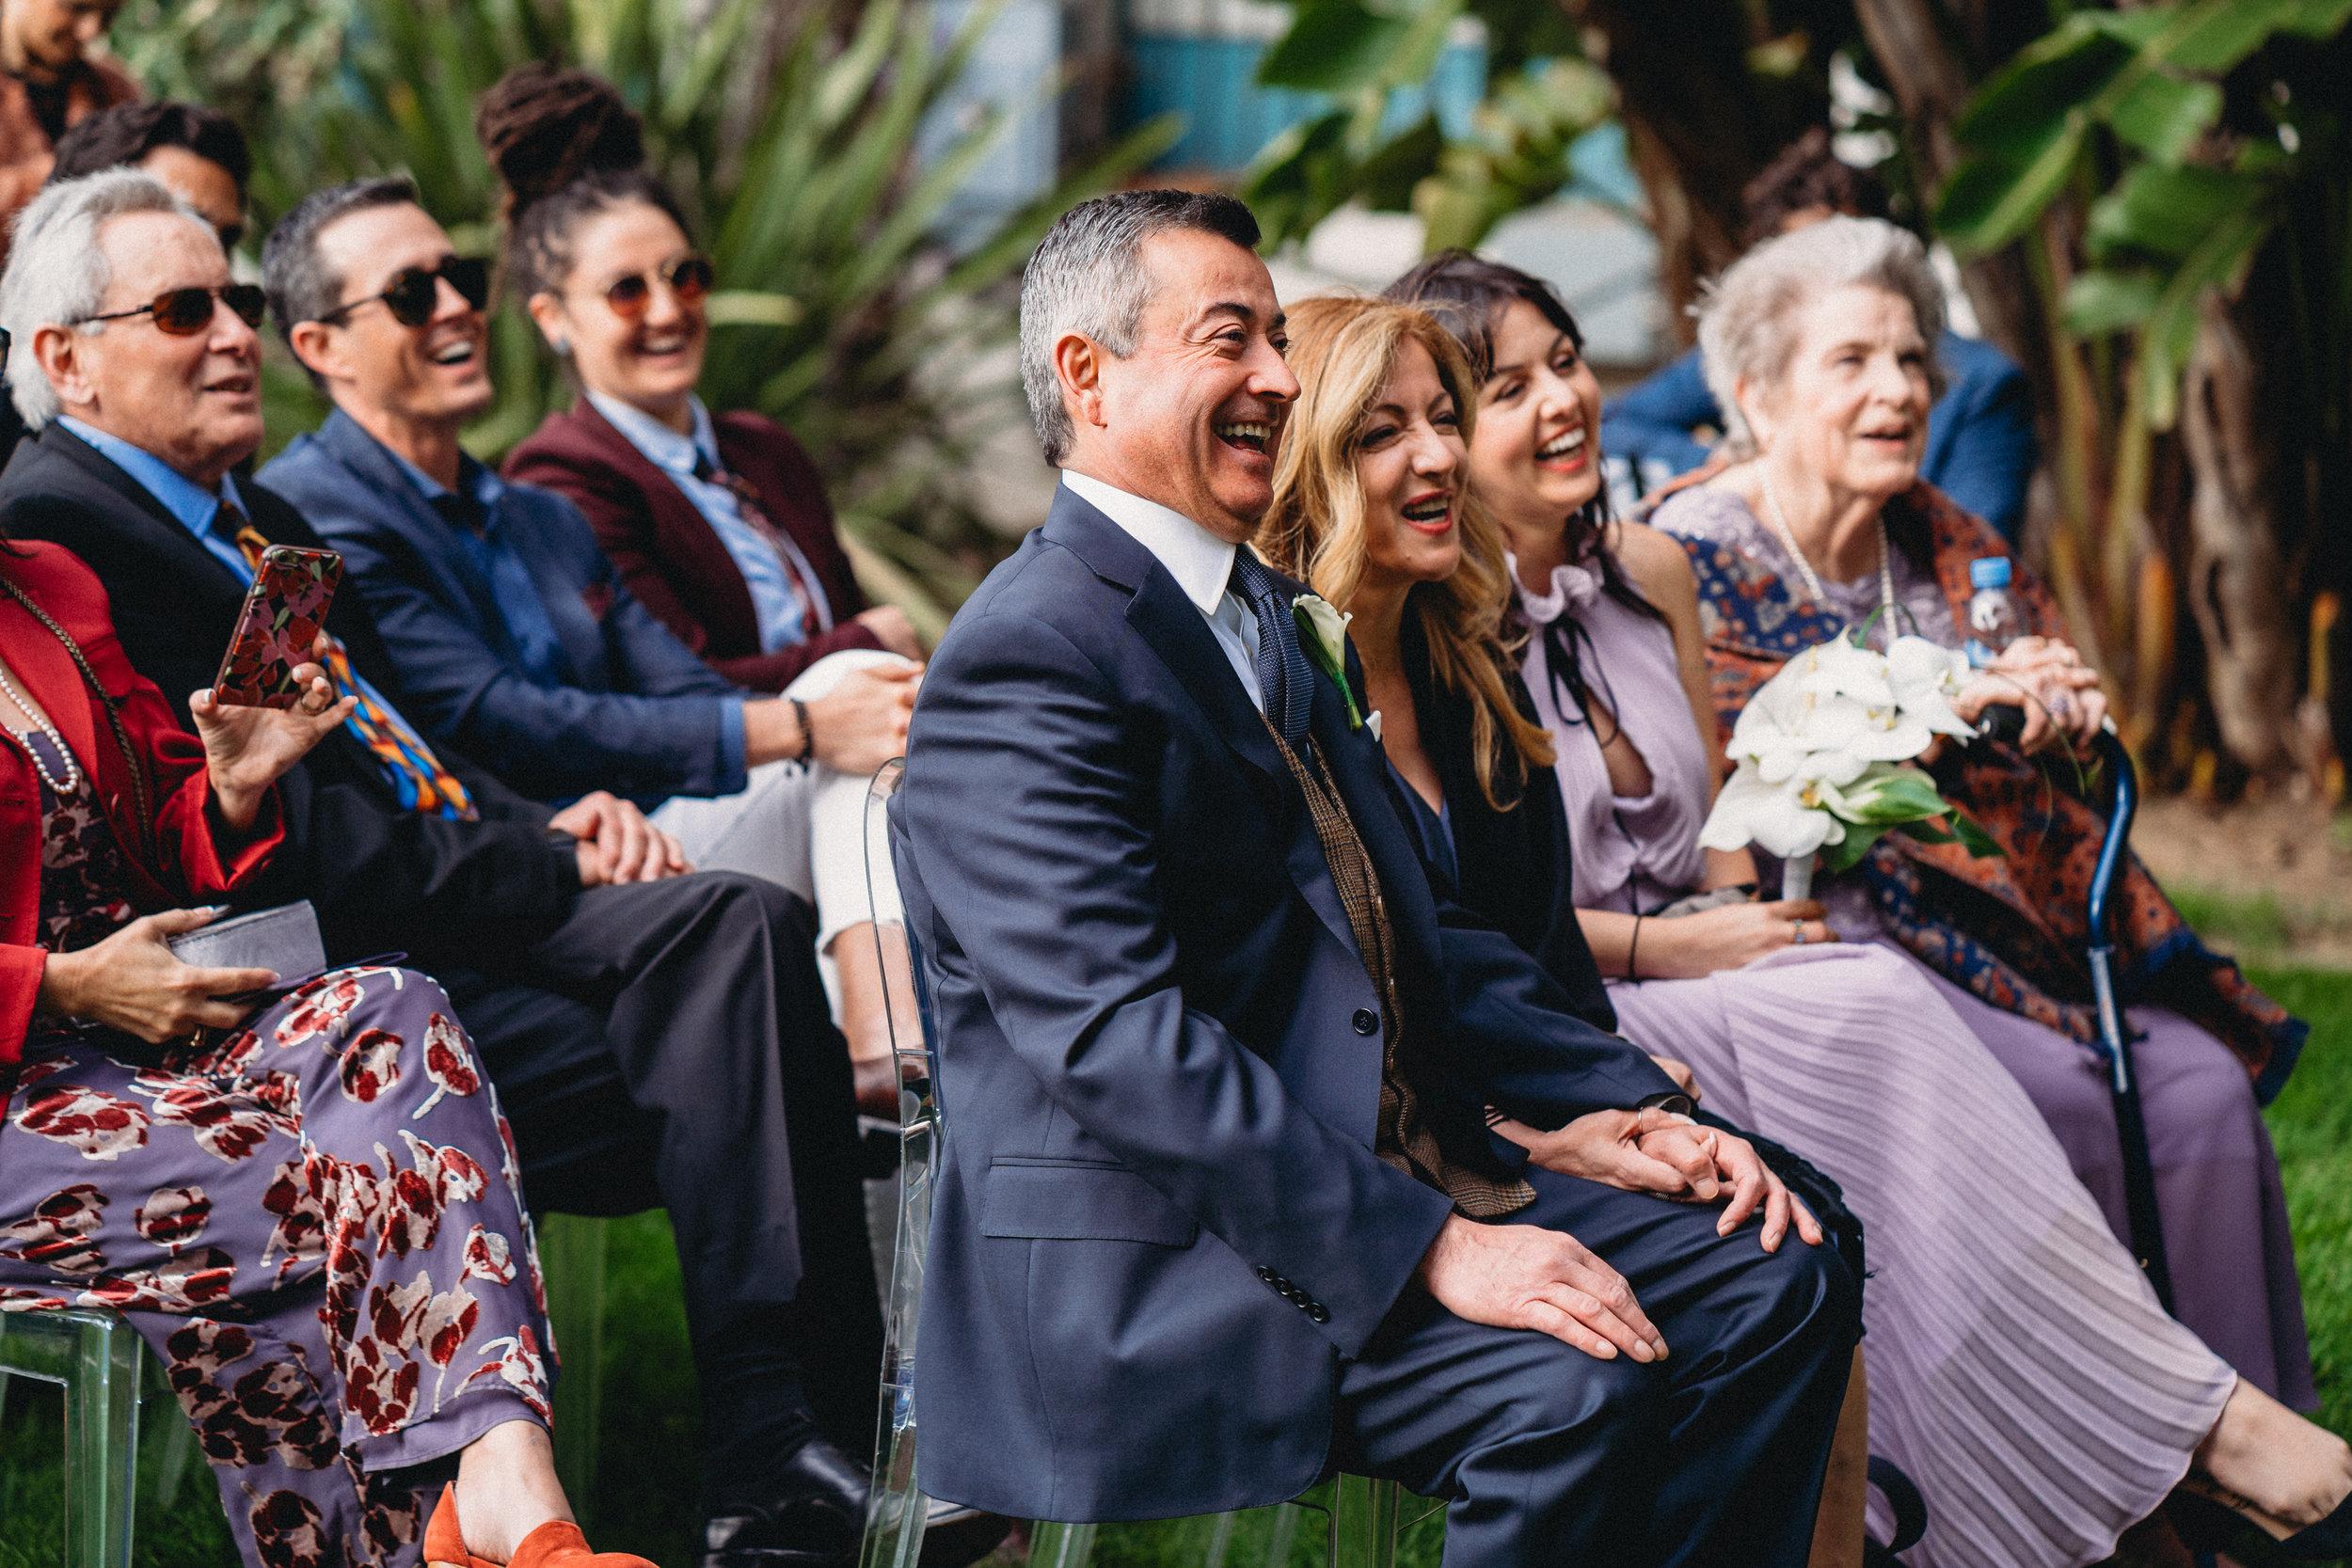 wedding-photography-santa-barbara-courthouse-rebeccaylasotras-68.jpg